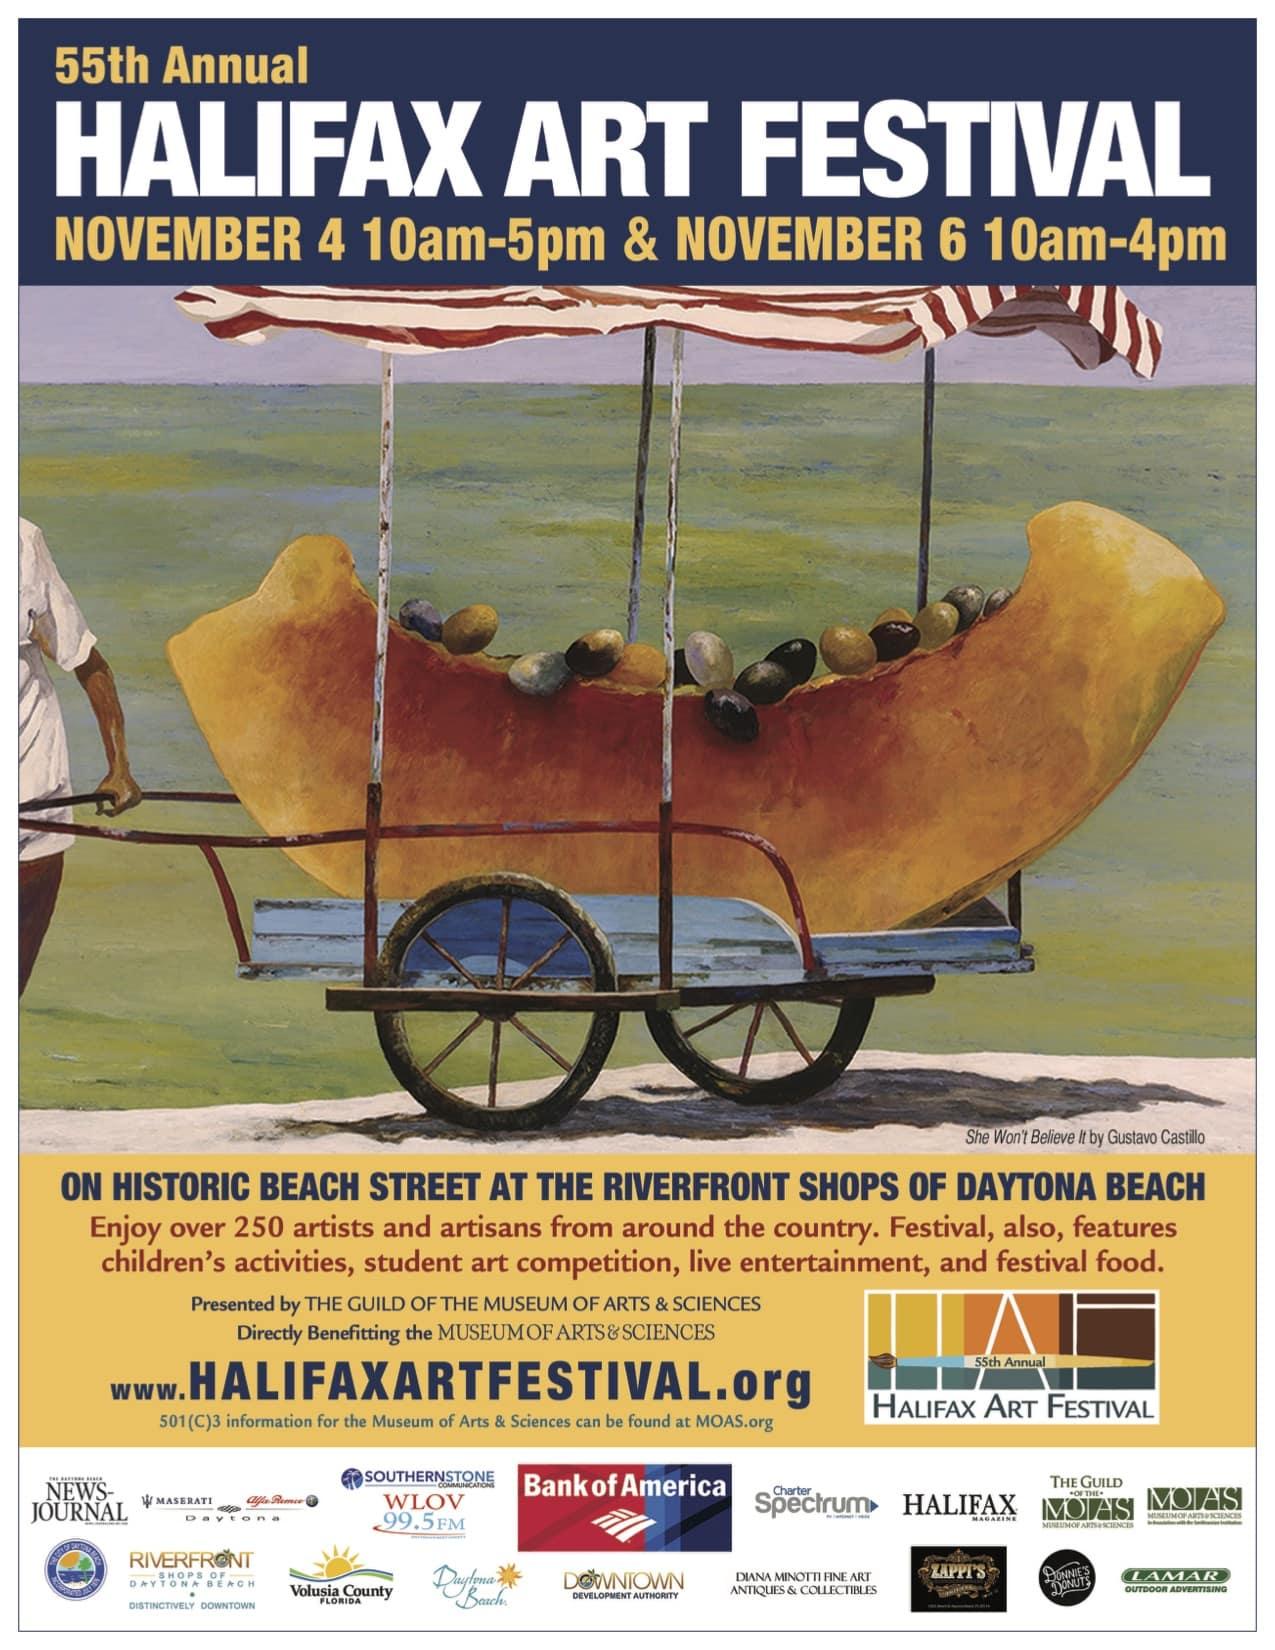 Halifax Art Festival